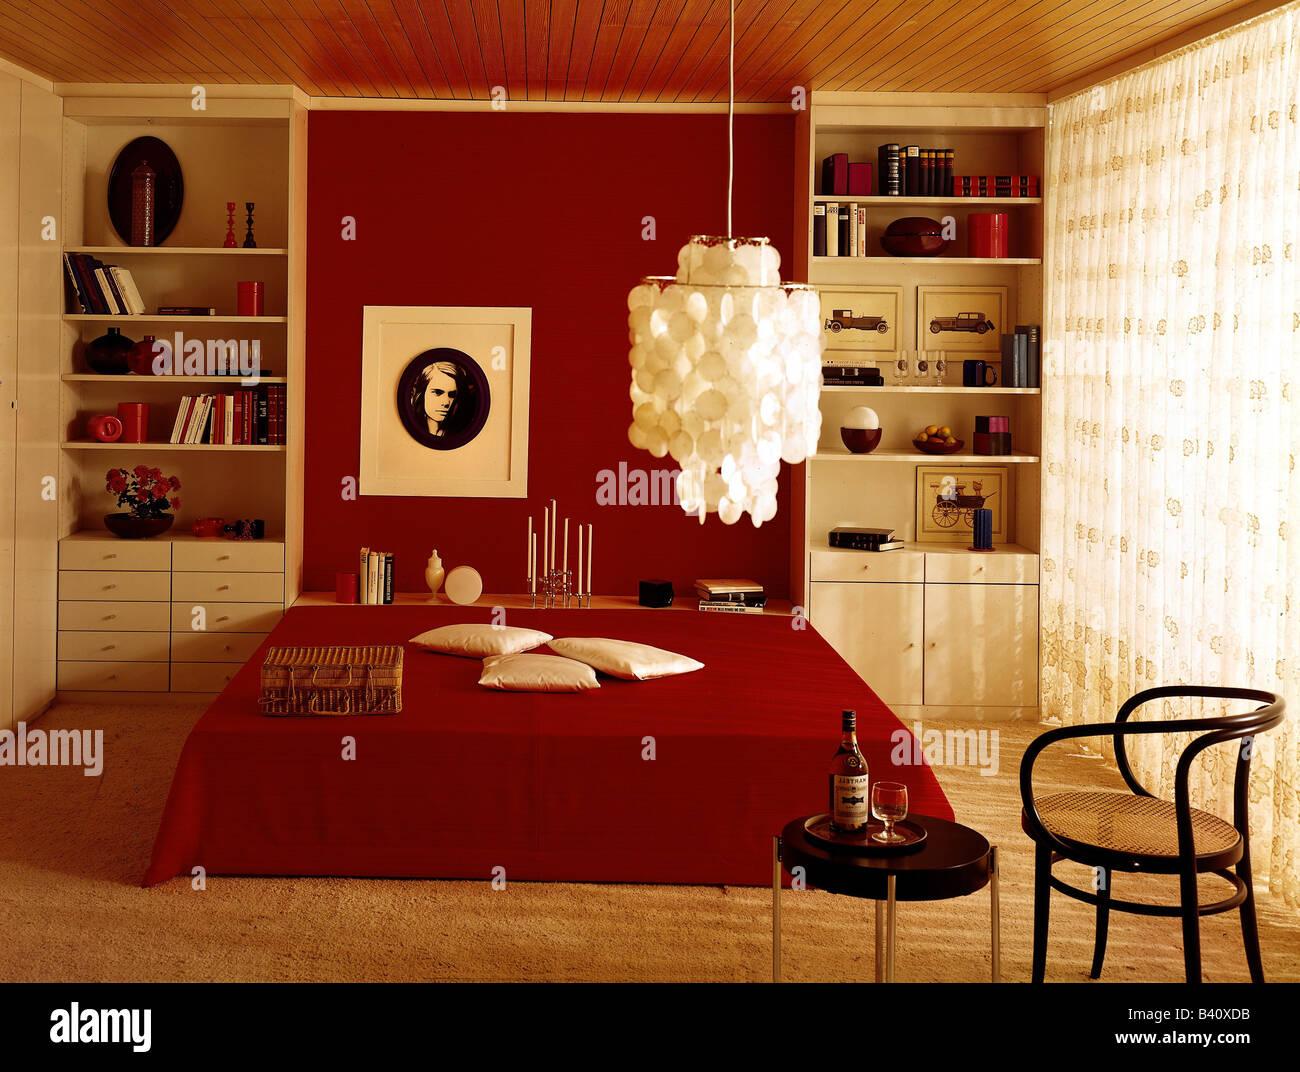 Muebles Dormitorio 70s 70s Hist Rico Hist Rico Mobiliario  # Muebles Historicos